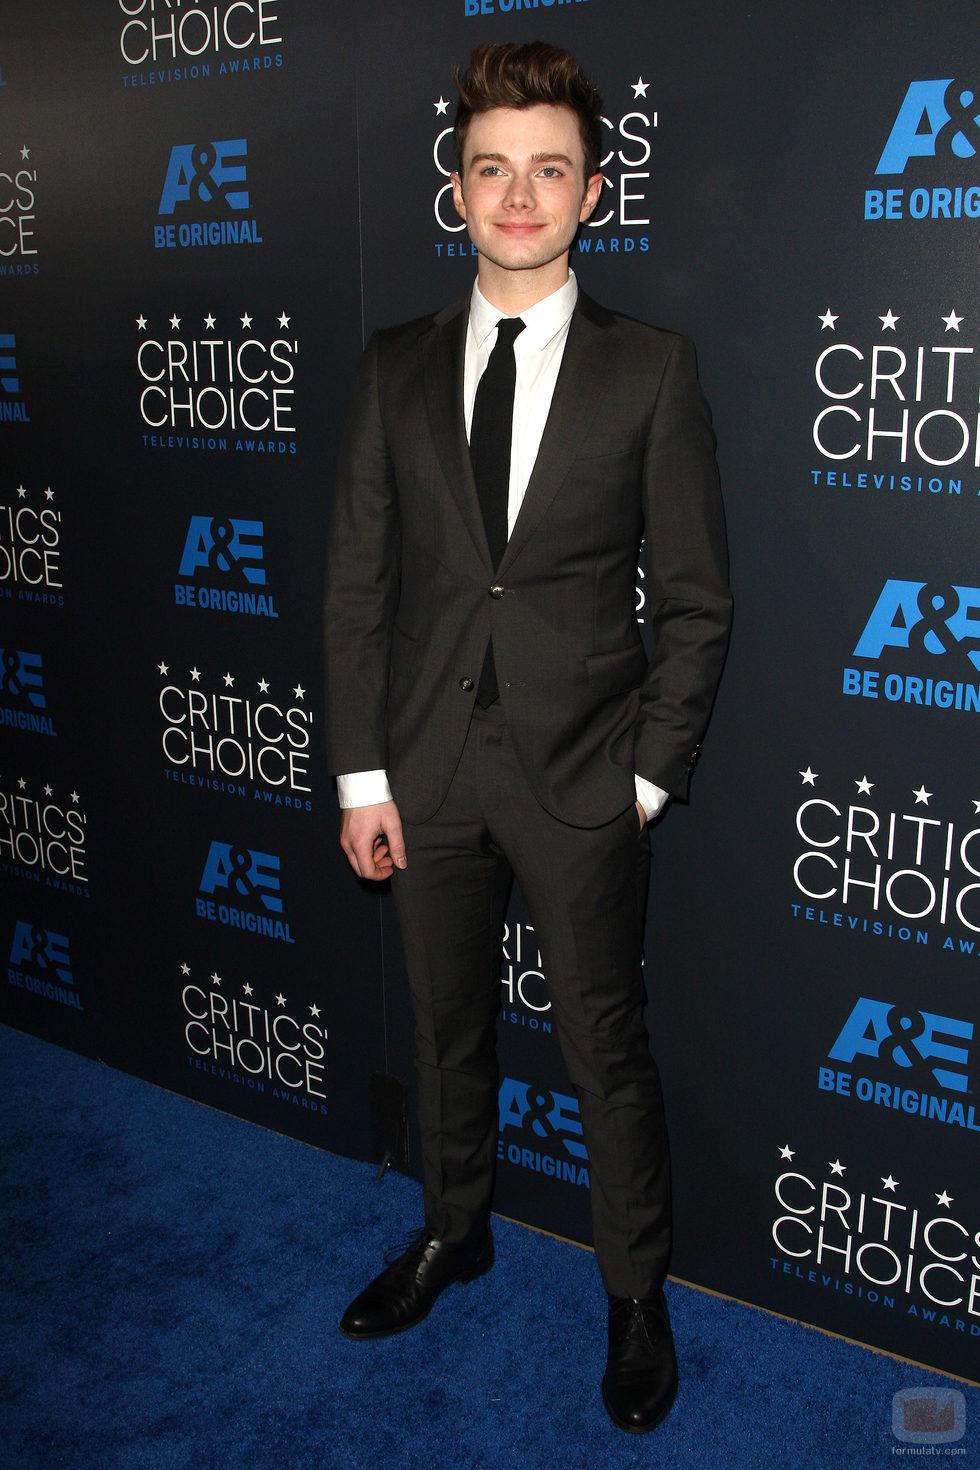 Chris Colfer en los Critics' Choice Awards 2015